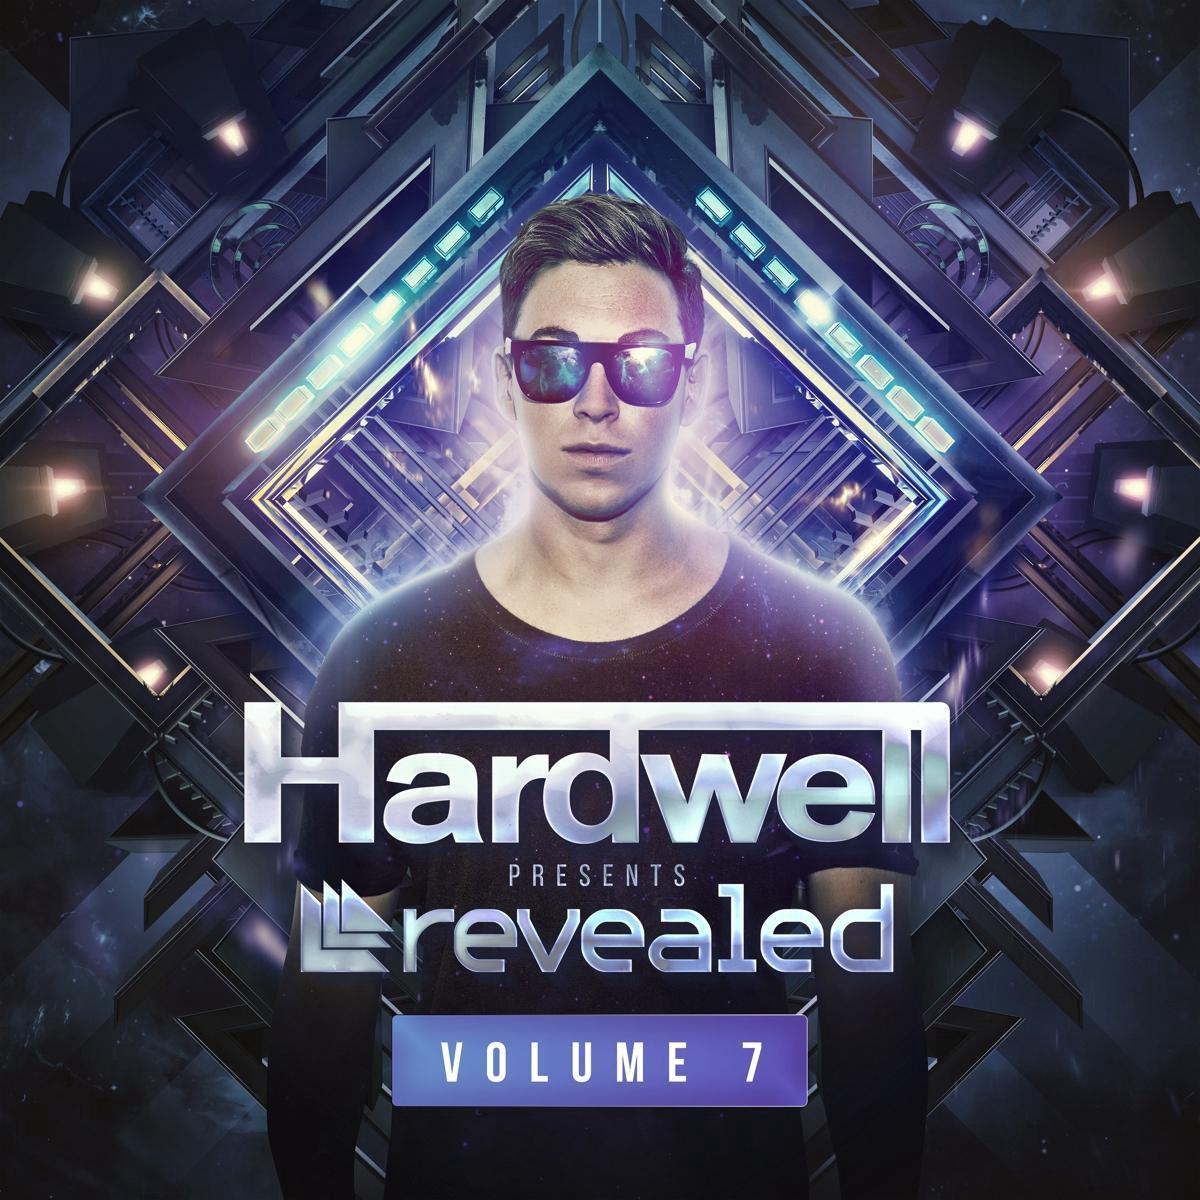 Presents Revealed Vol 7 (Ltd Vinyl) - Hardwell